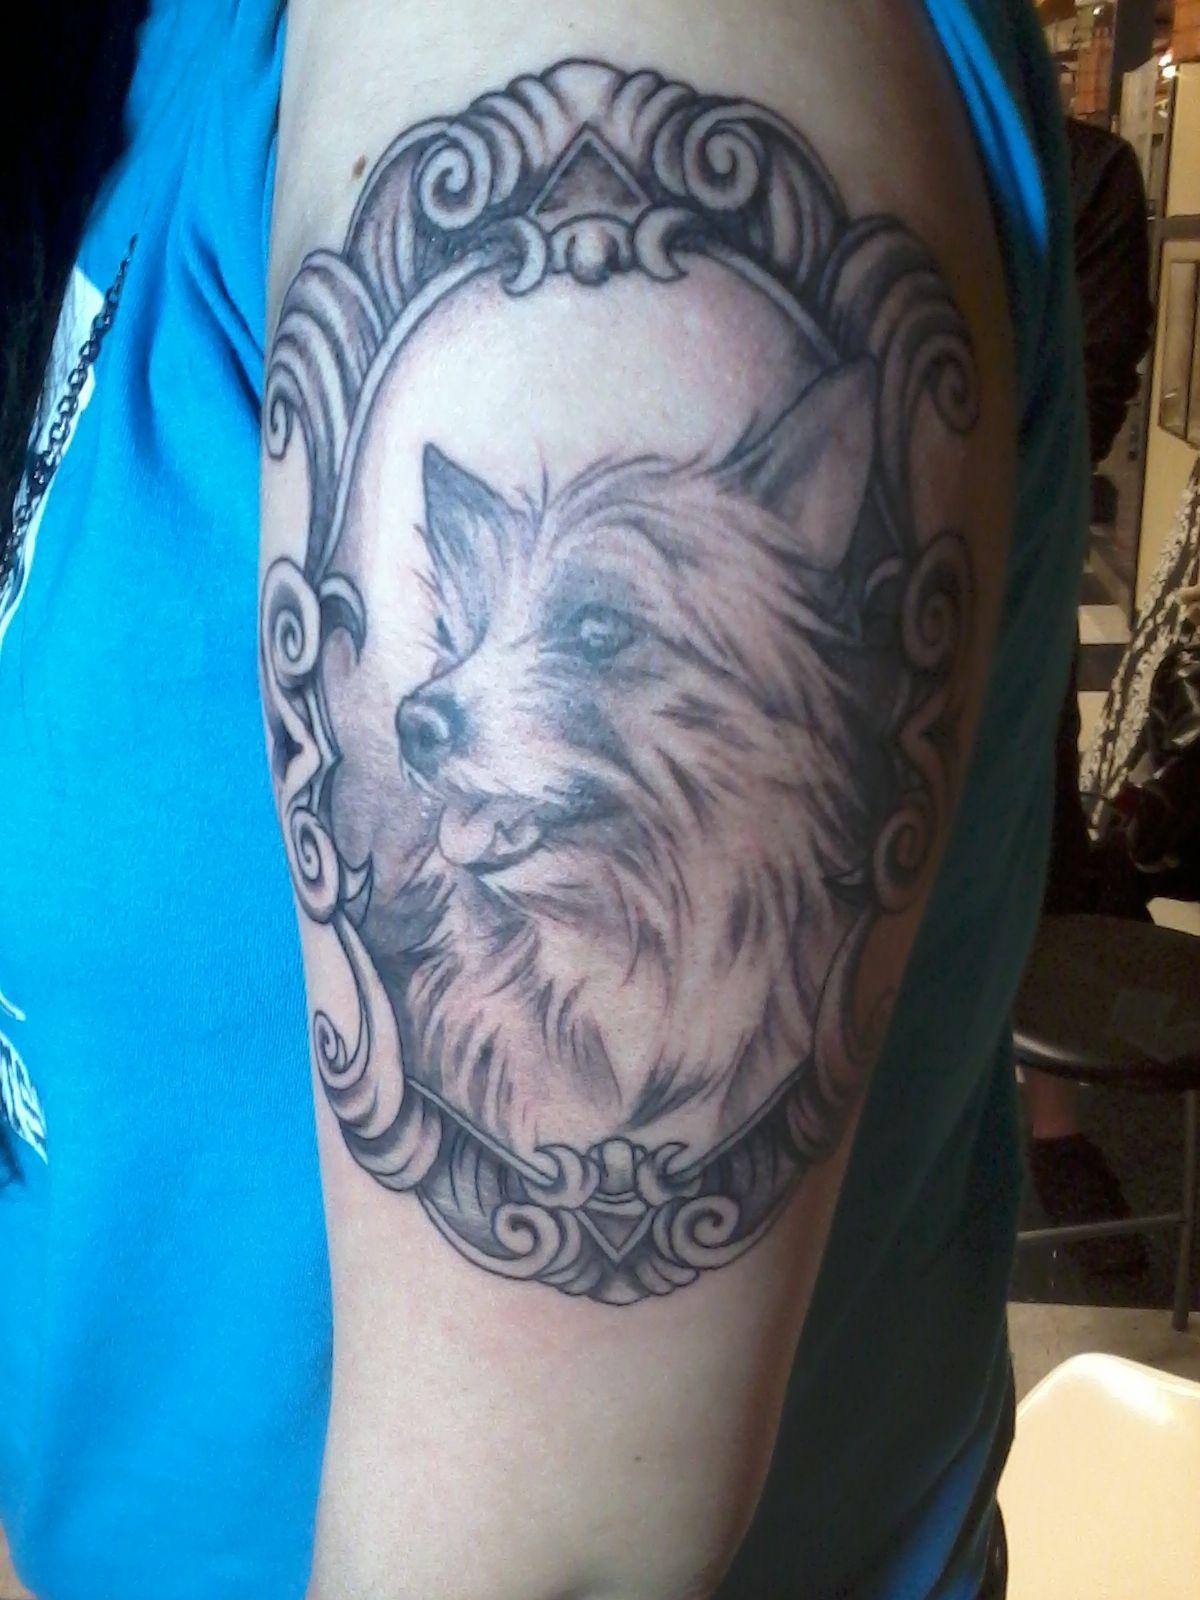 Dog tattoo ideas for women - 30 Beautiful Dog Tattoos Ideas For Men And Women